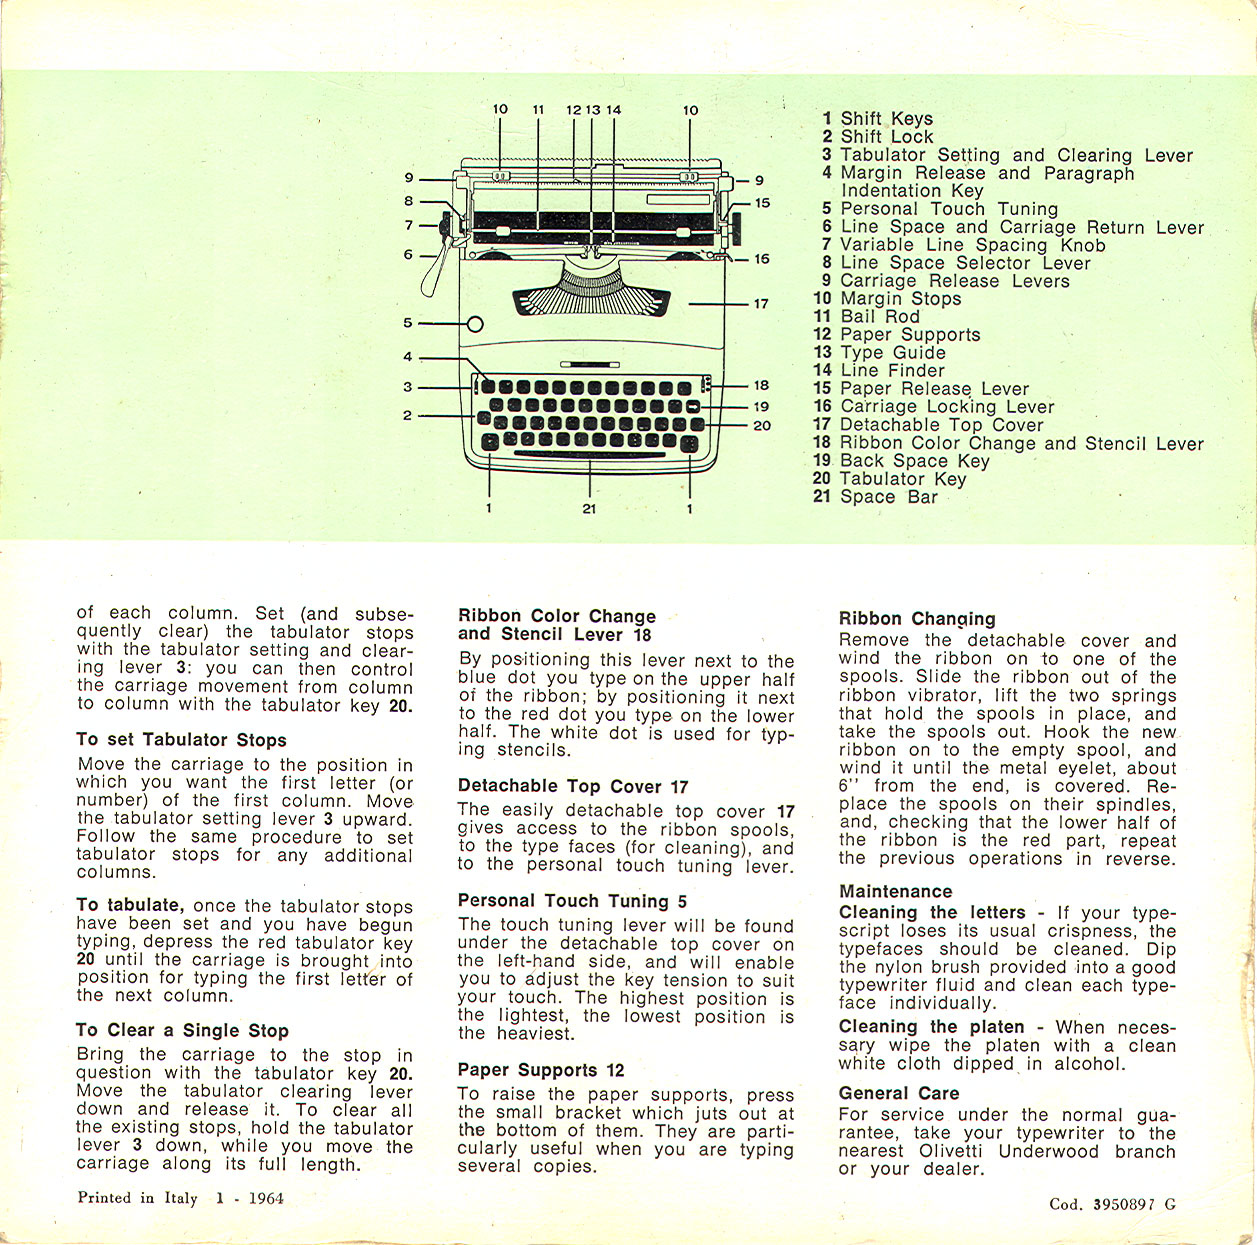 Maquina de escribir olivetti ms 30 plus dating 3